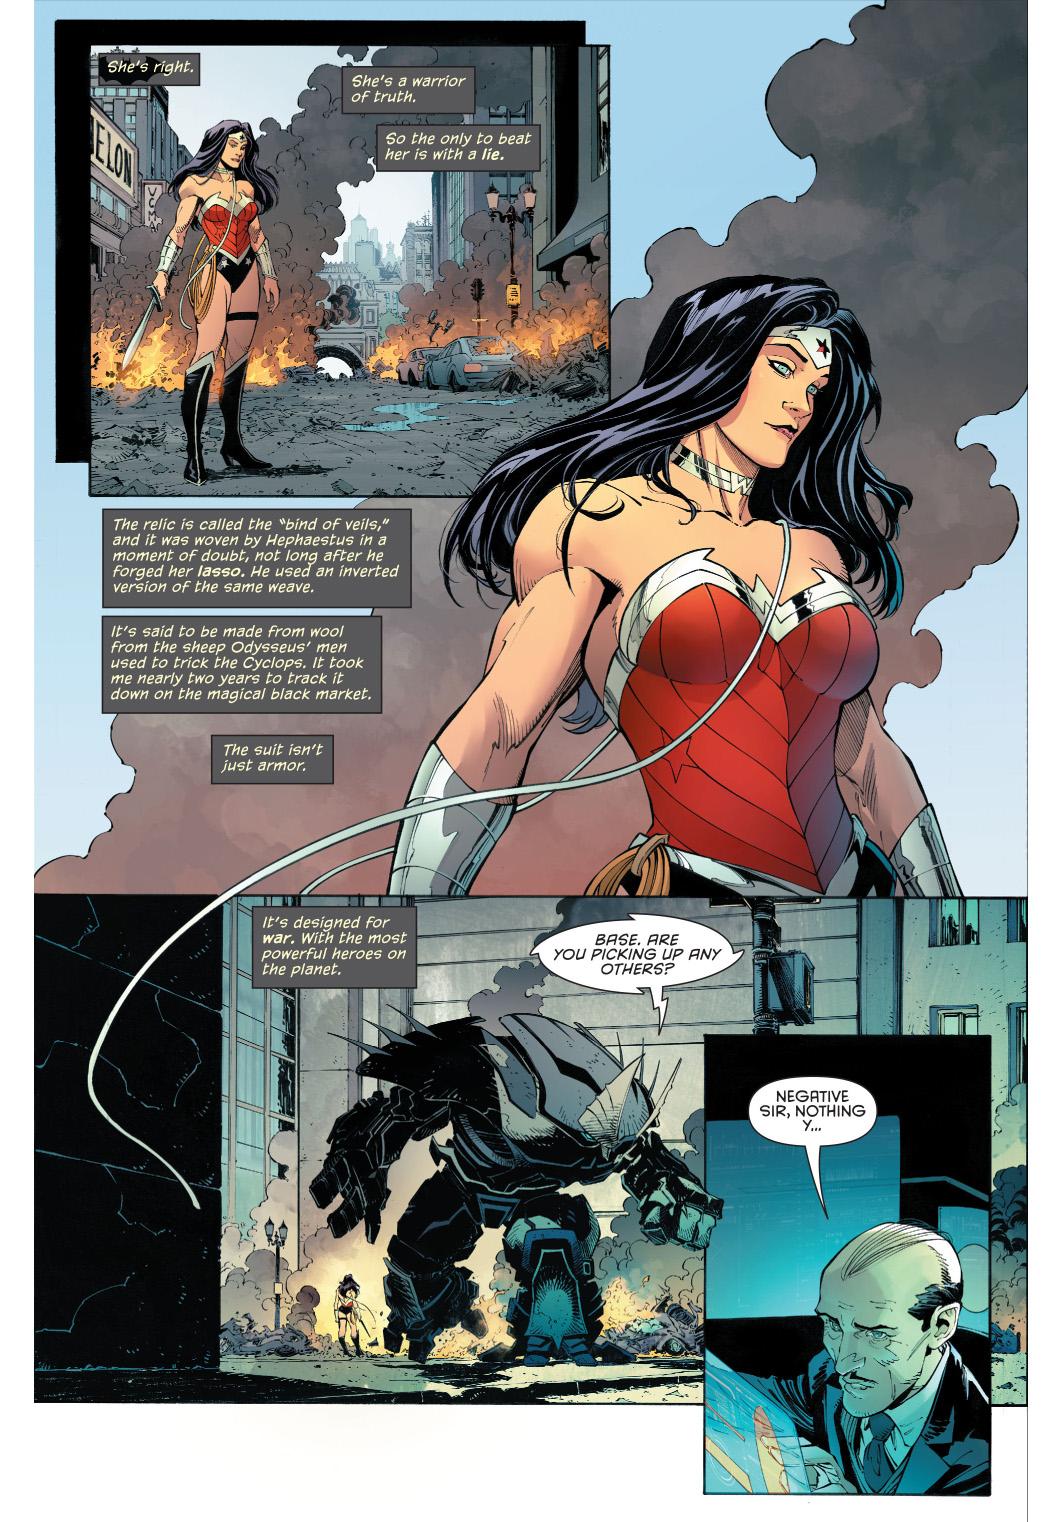 Wonder woman batman sex pics superheroes pictures-5228